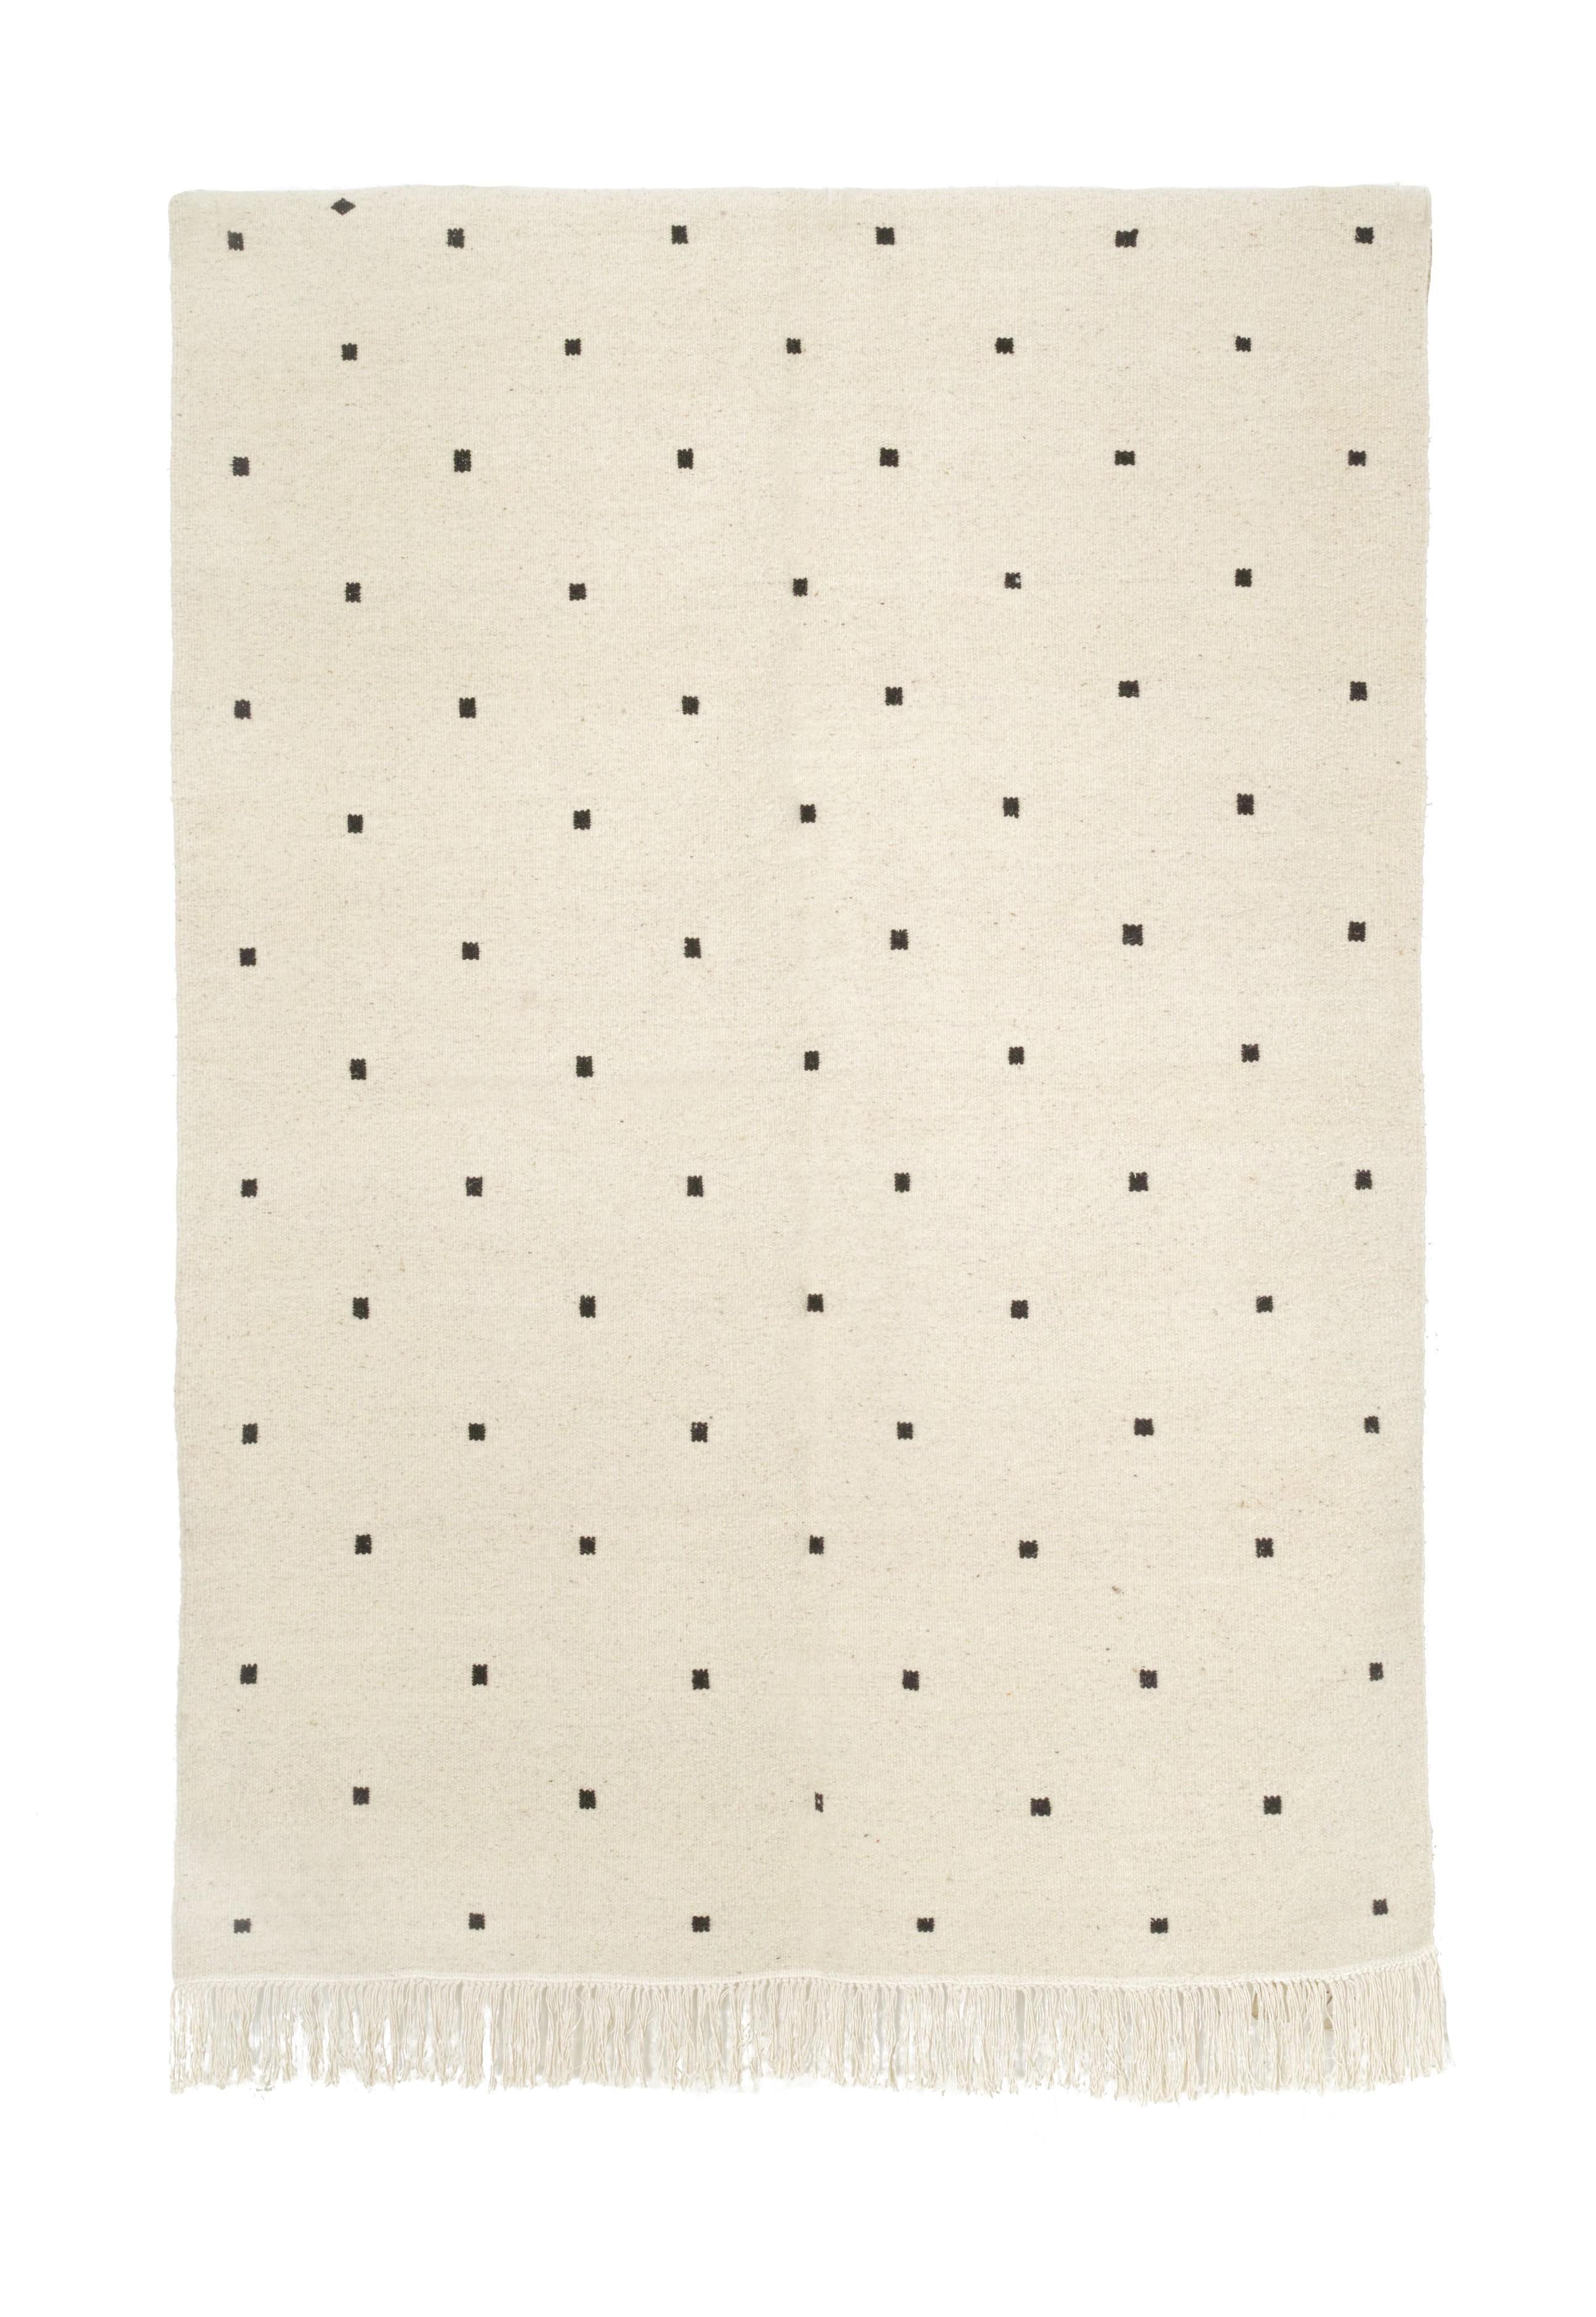 KILIM BERBERE 186 x 133 cm